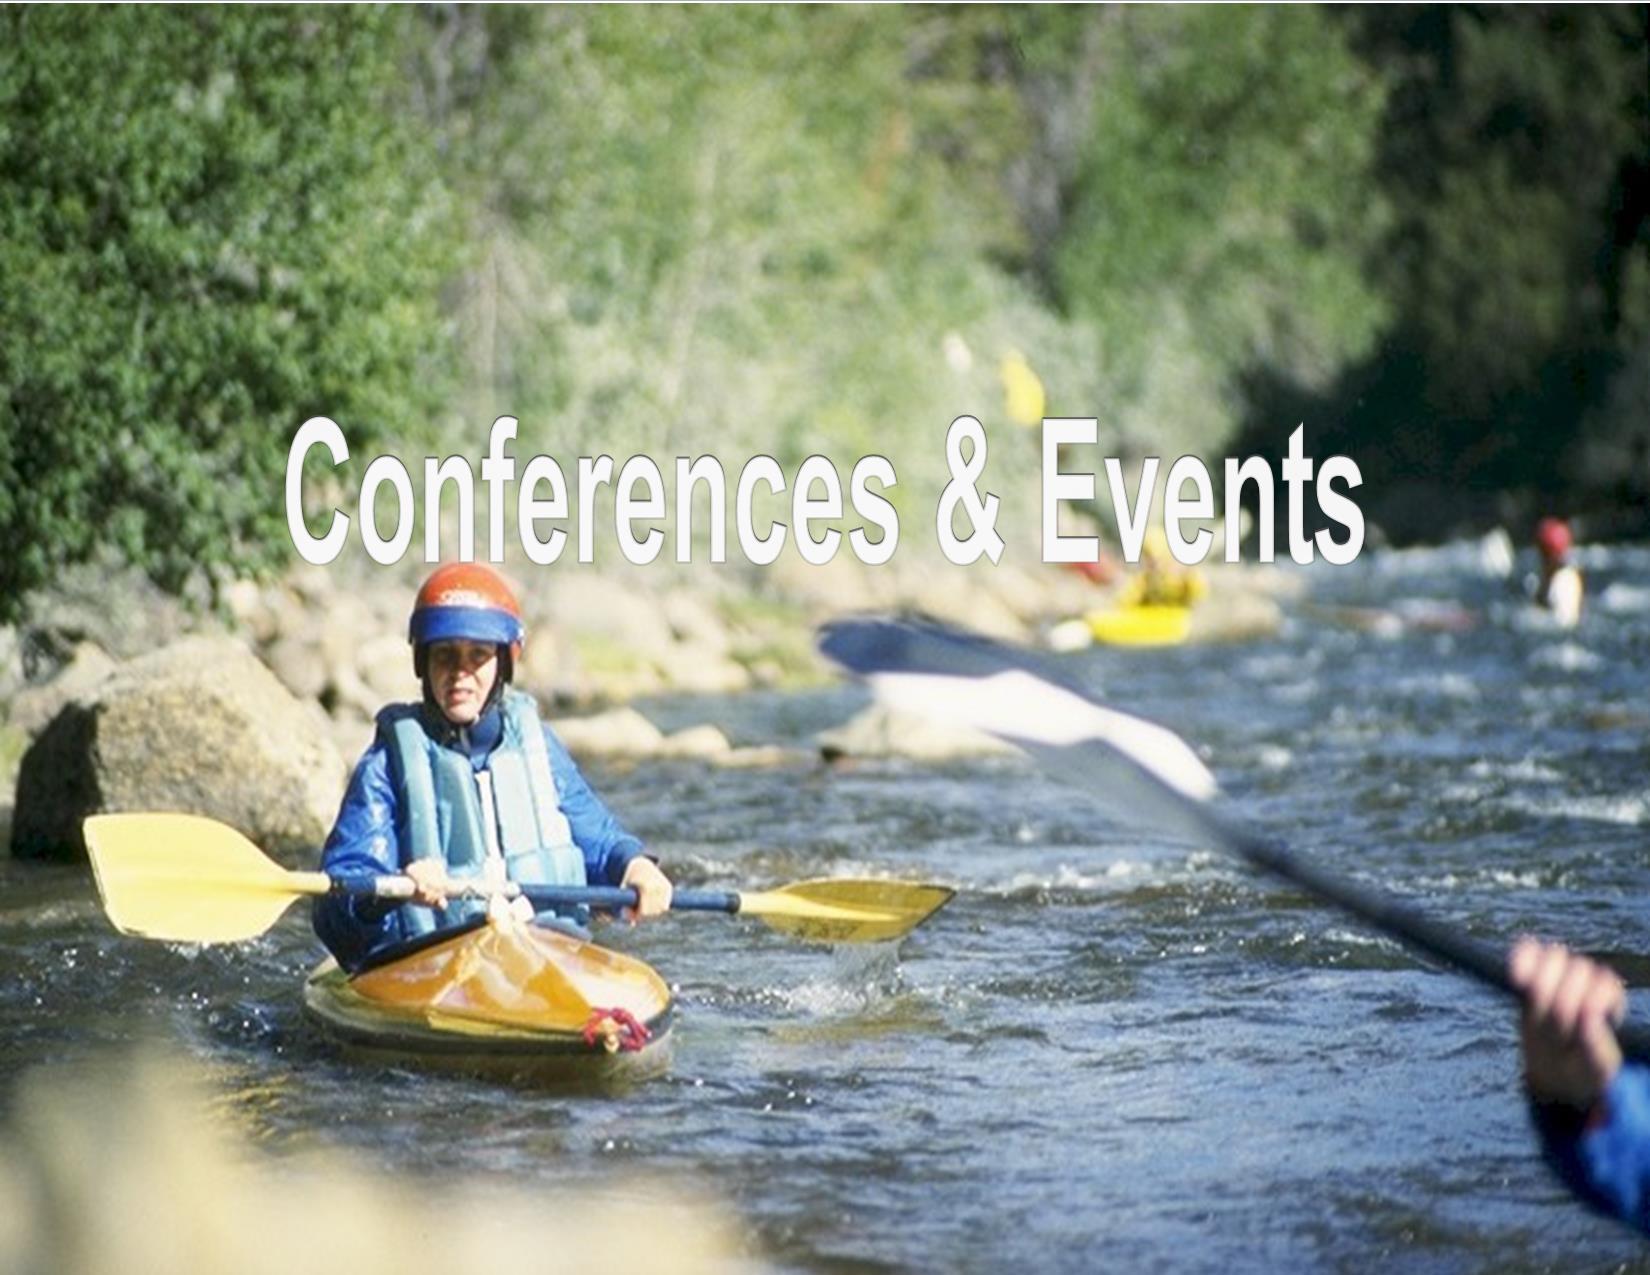 Woman kayaking in river, Division of Wildlife, Colorado Division of Wildlife